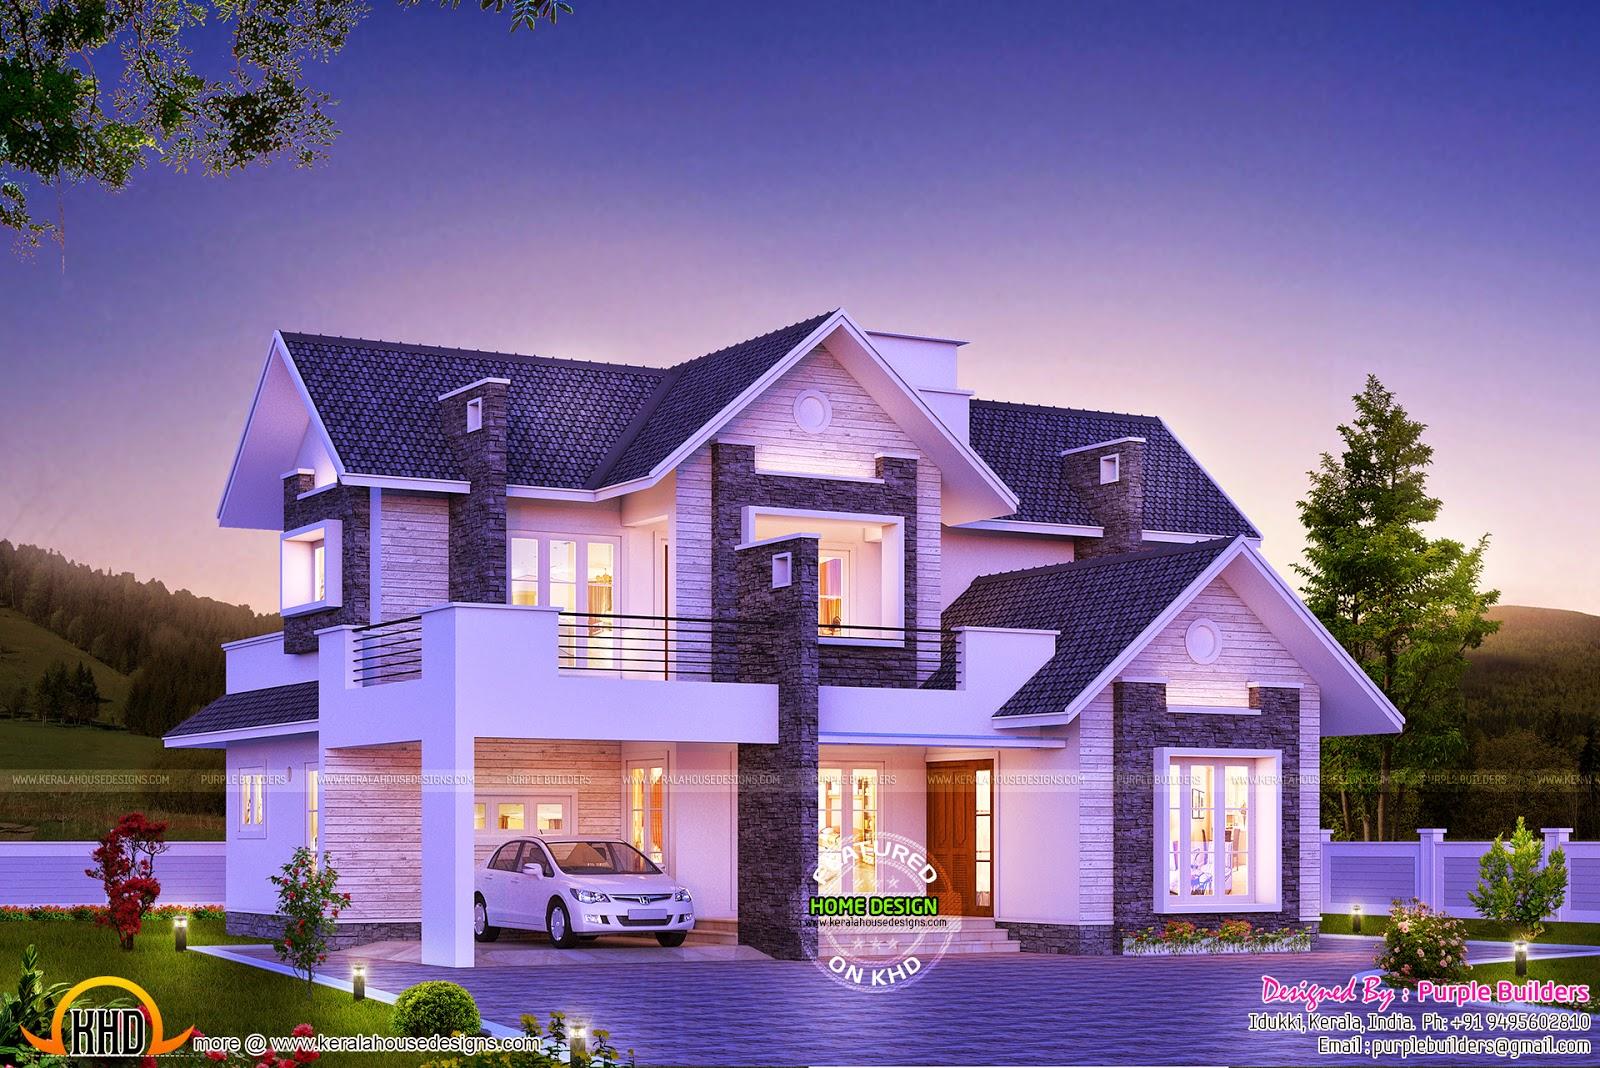 Super dream home - Kerala home design and floor plans - 8000+ houses